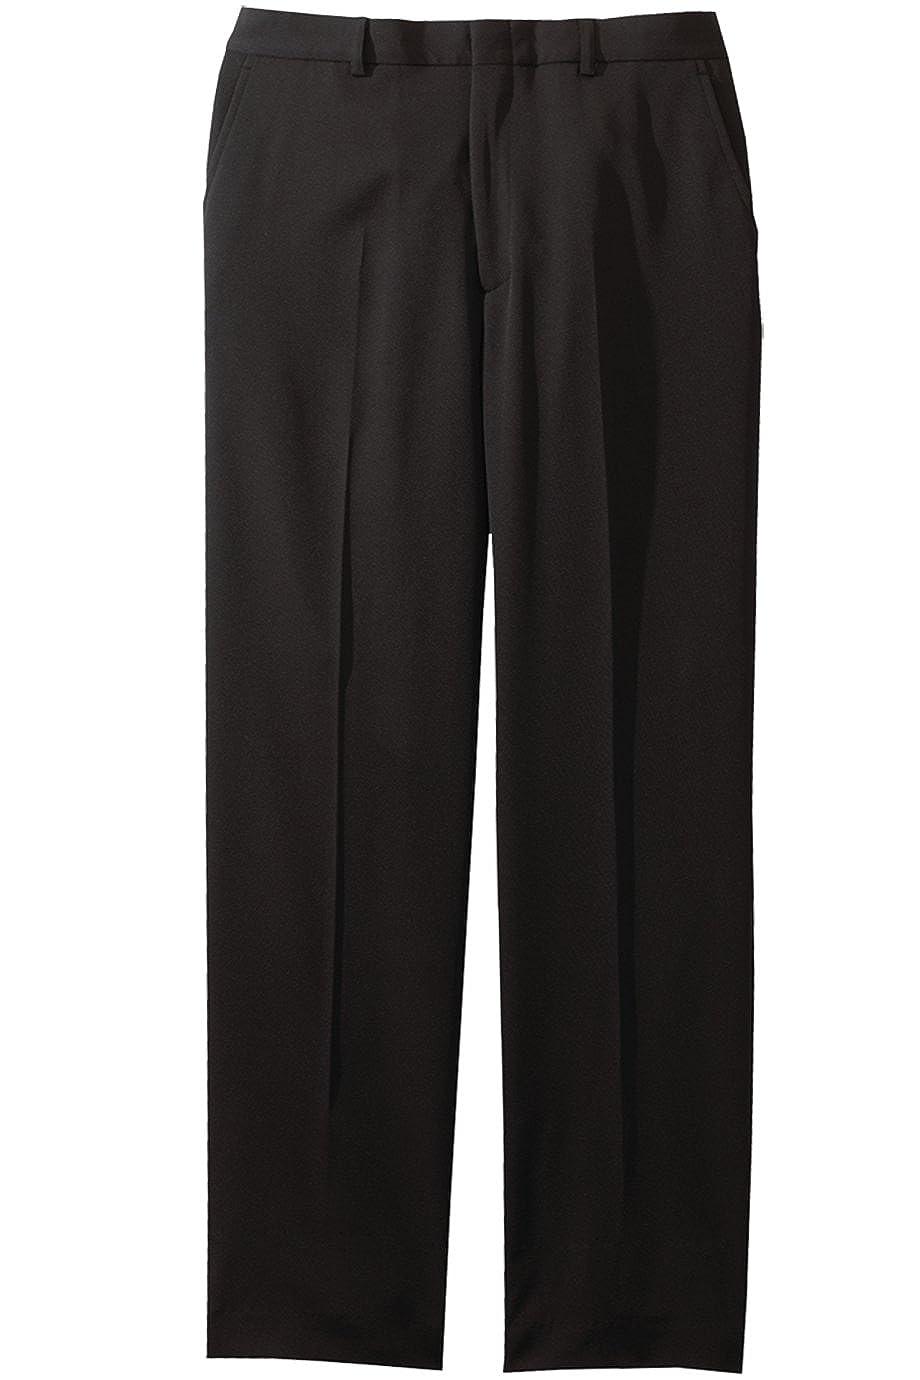 Black 50-28 Ed Garments MenS 2550 Hook Eye Nylon Zipper Casual Pants